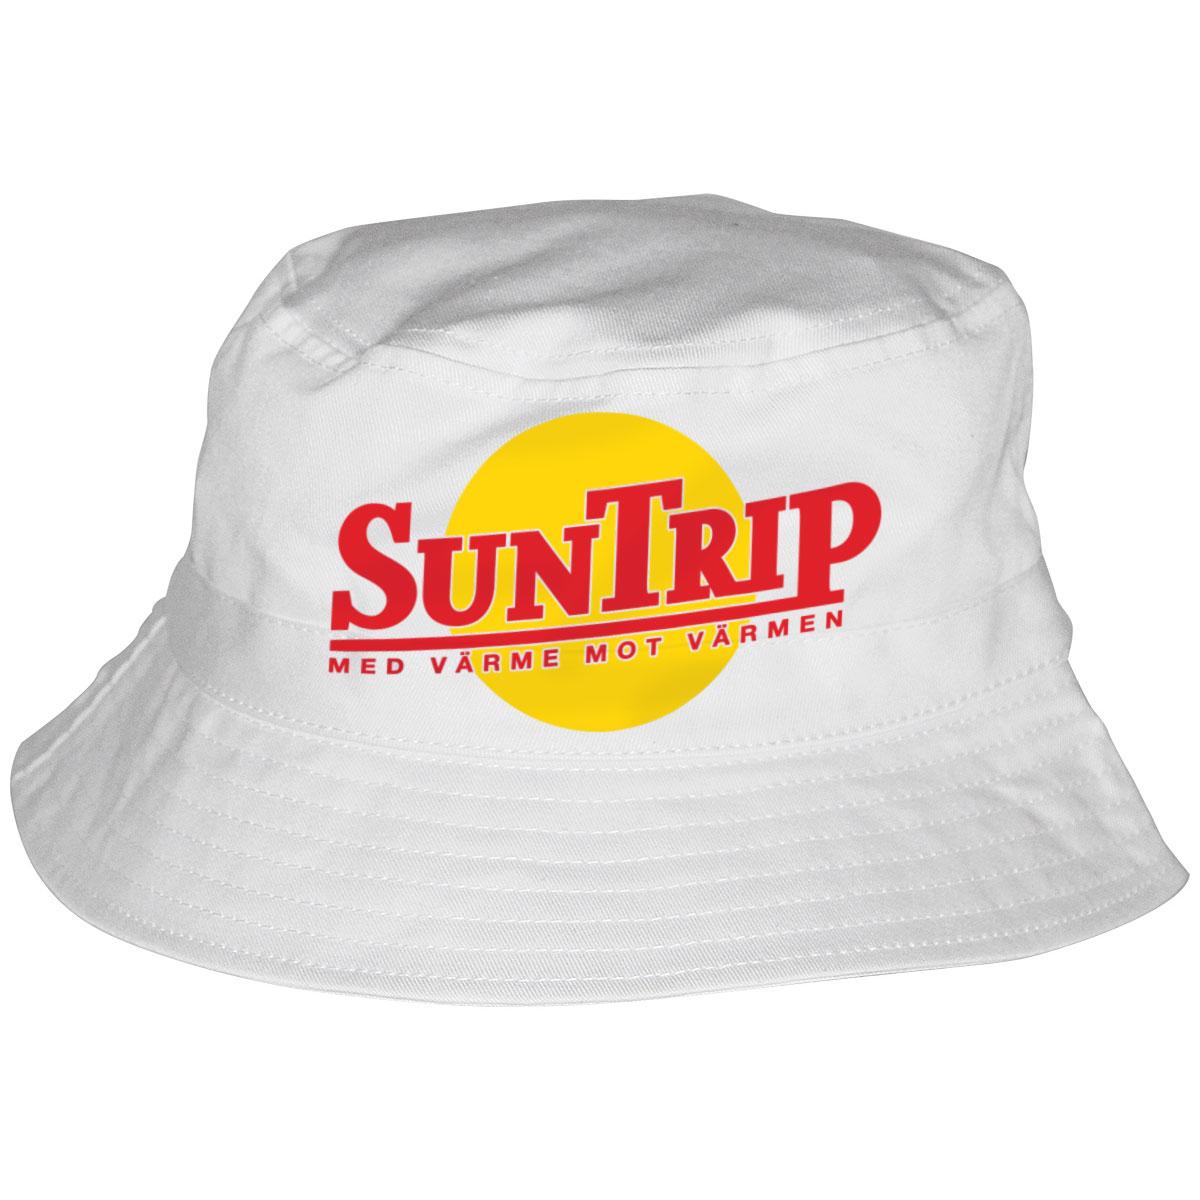 Suntrip Bucket Hat